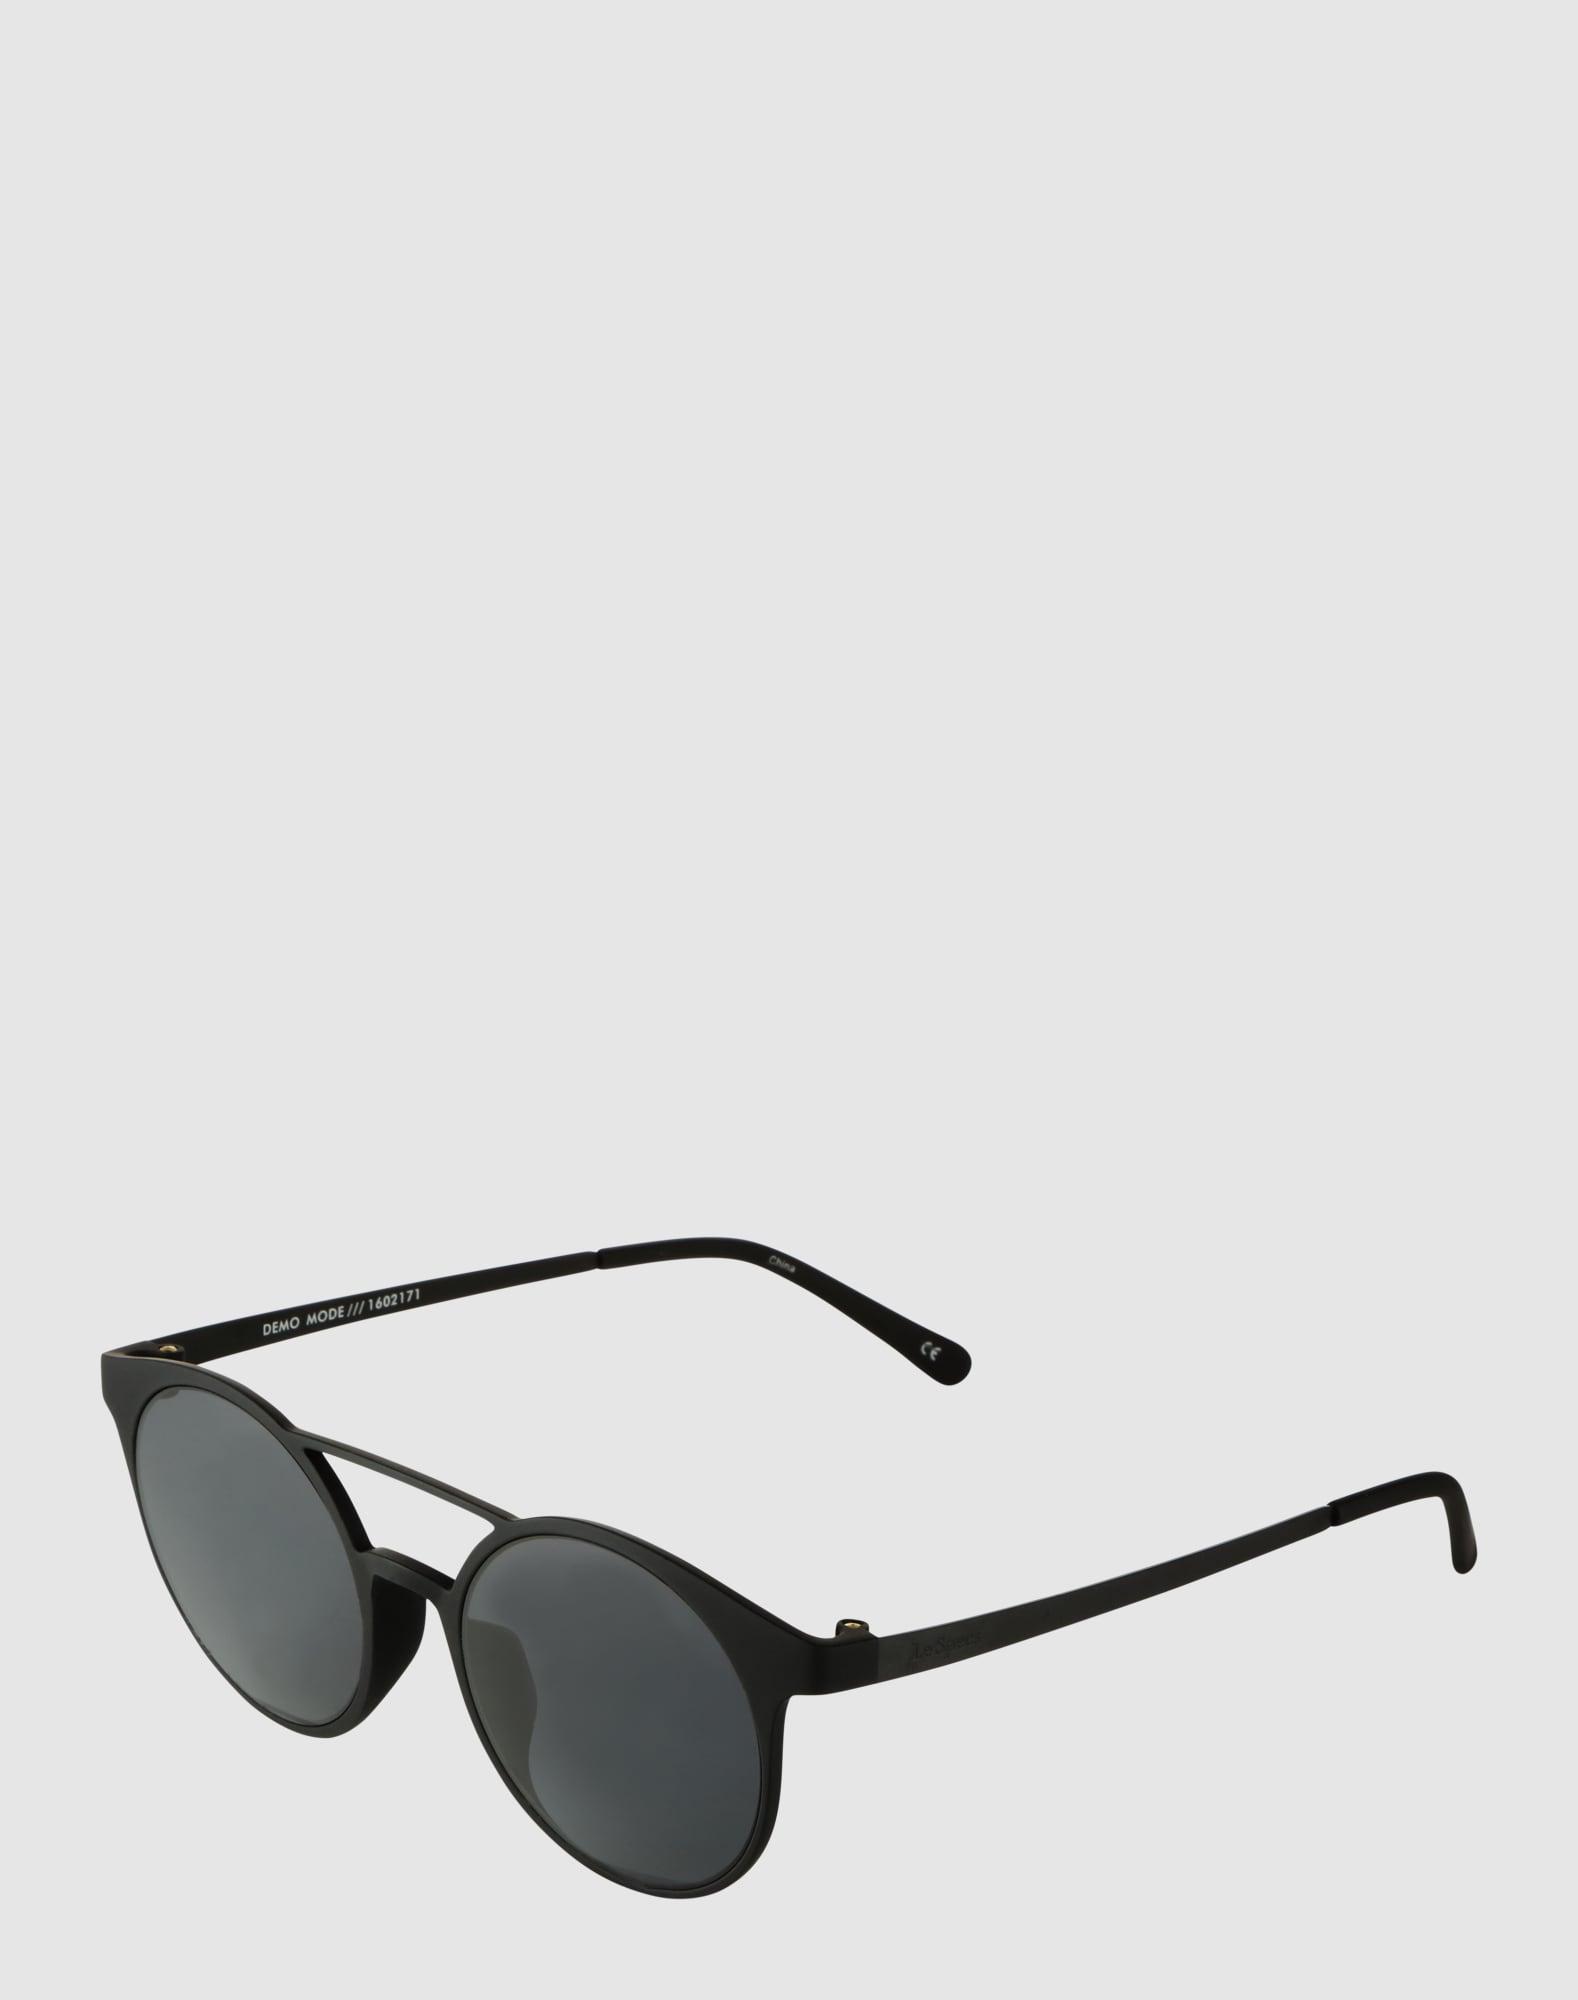 le specs sonnenbrille 39 demo mode 39 in schwarz about you. Black Bedroom Furniture Sets. Home Design Ideas